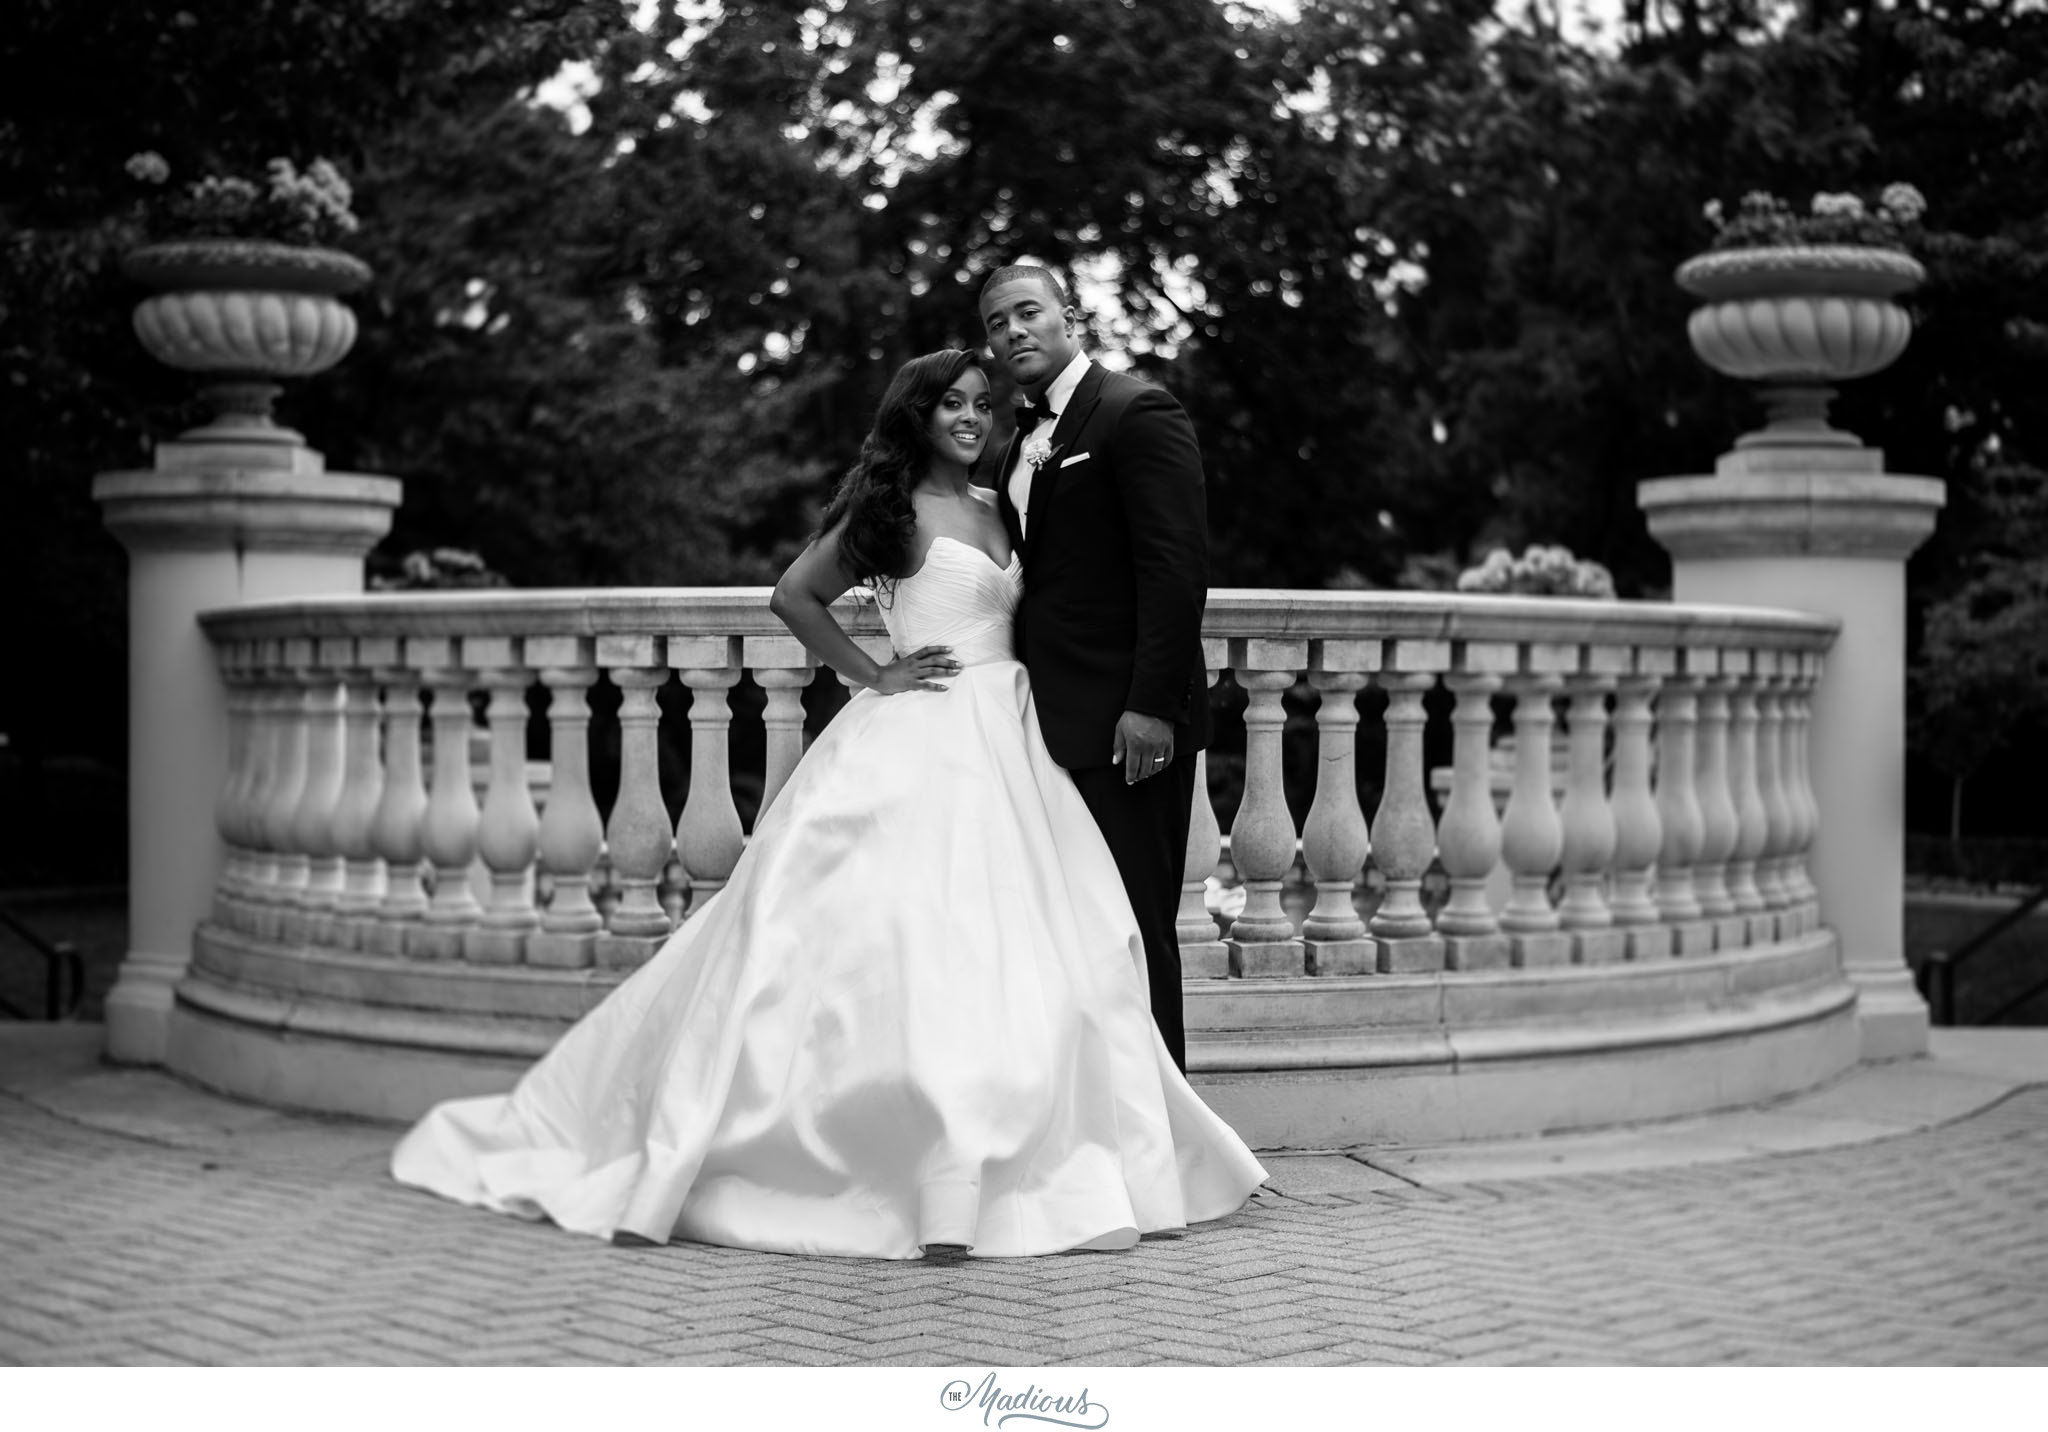 nmwa+wedding,+women+in+the+arts+wedding,+ethiopian+wedding,+dc+wedding+0144.jpg